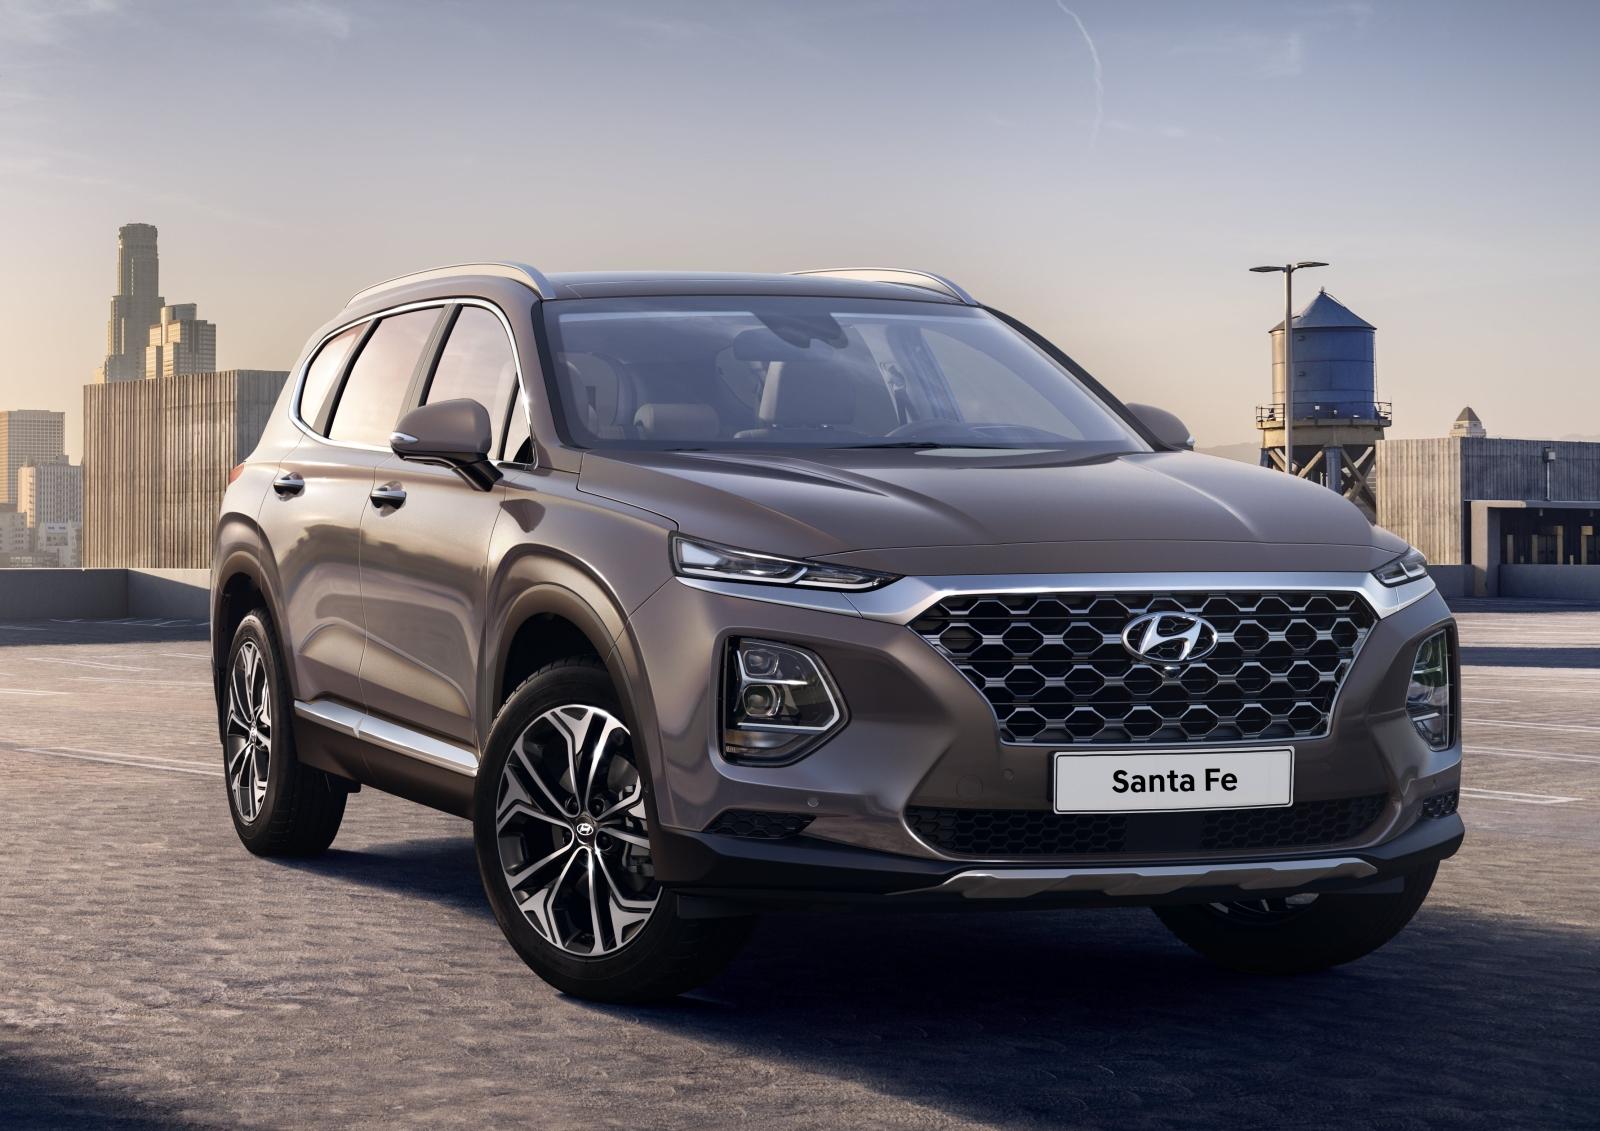 Hyundai_New Santa Fe exterior